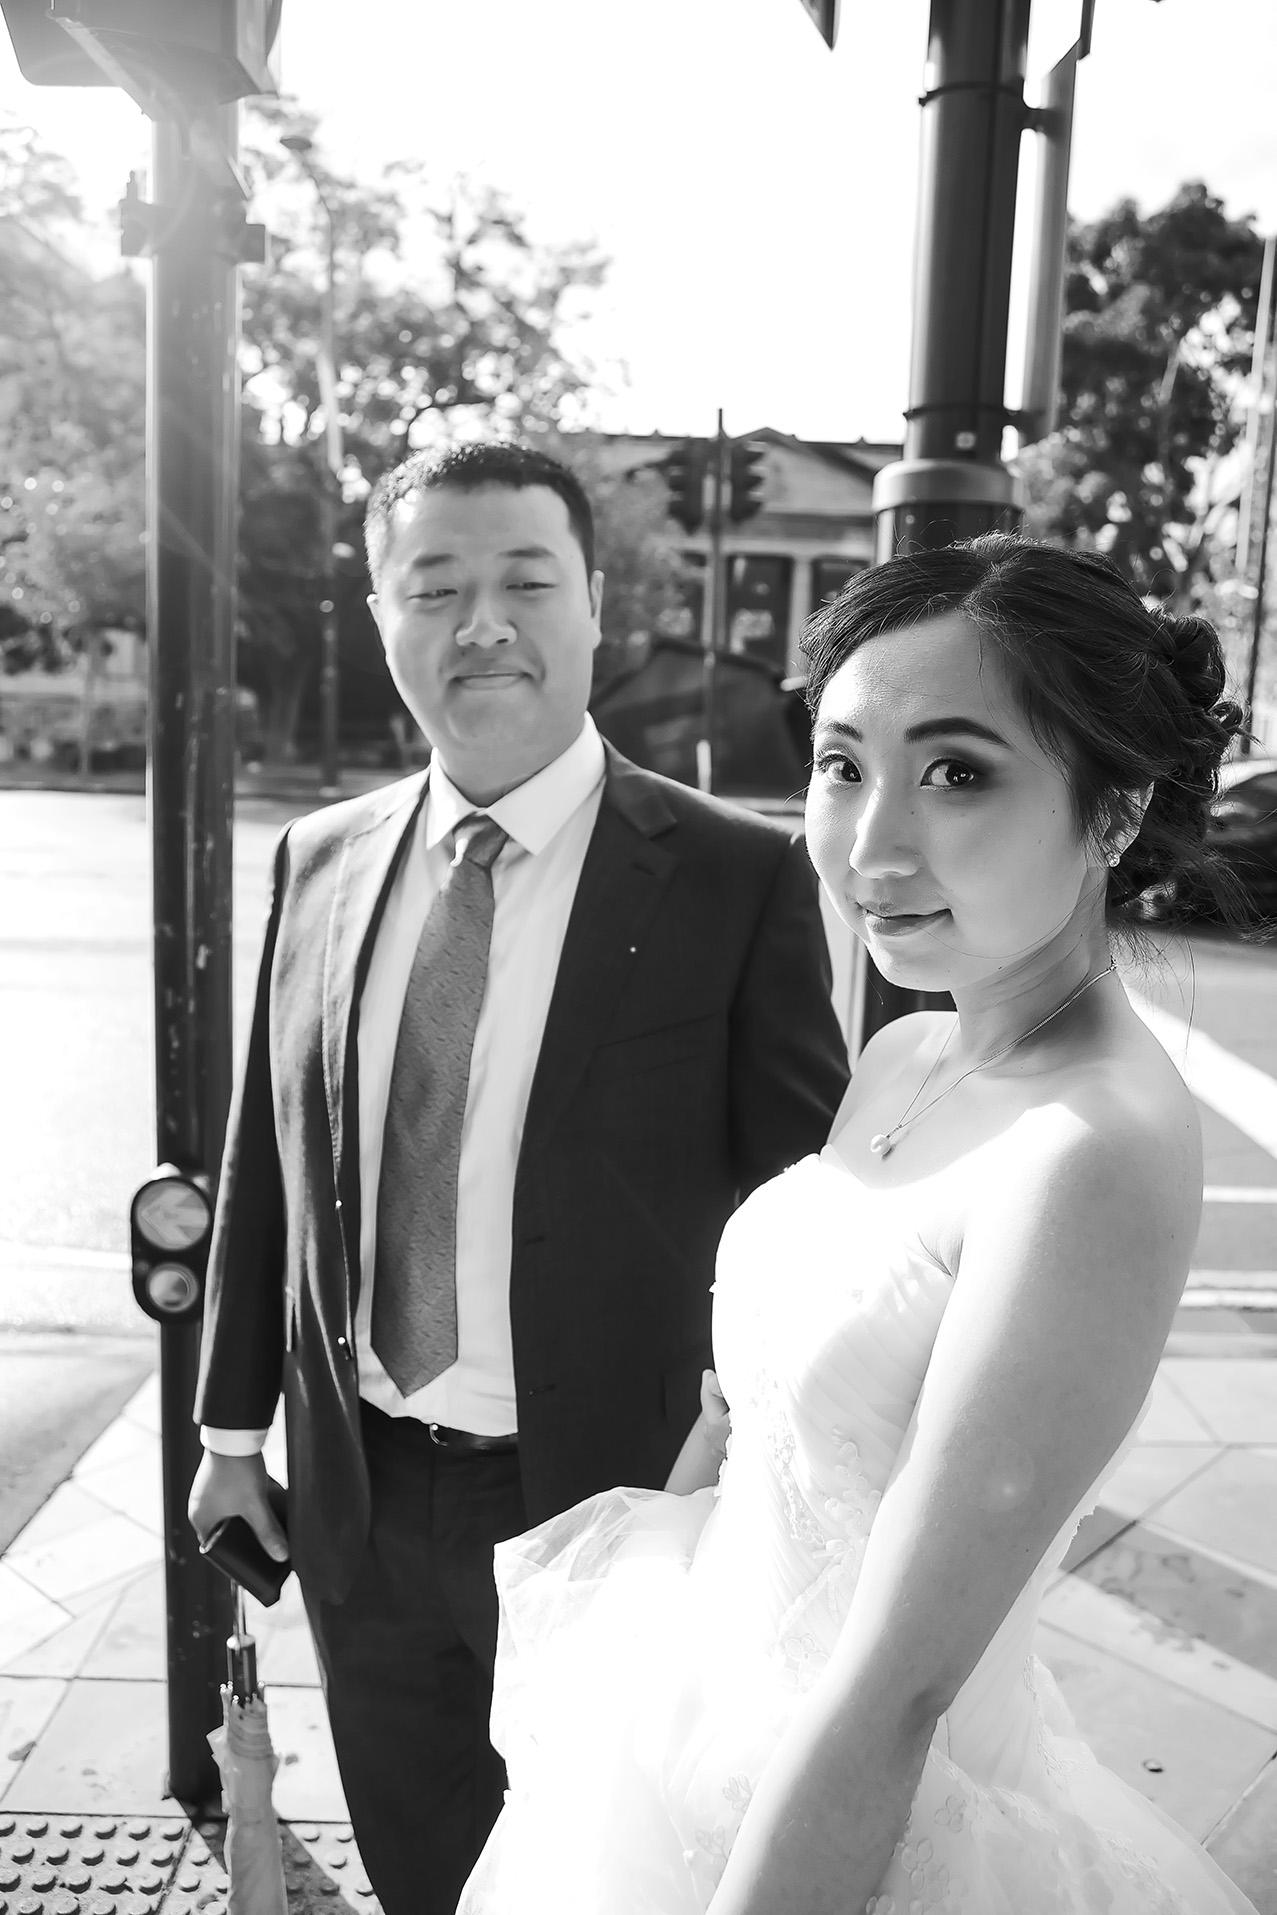 Adelaide City Black and White Wedding Portrait